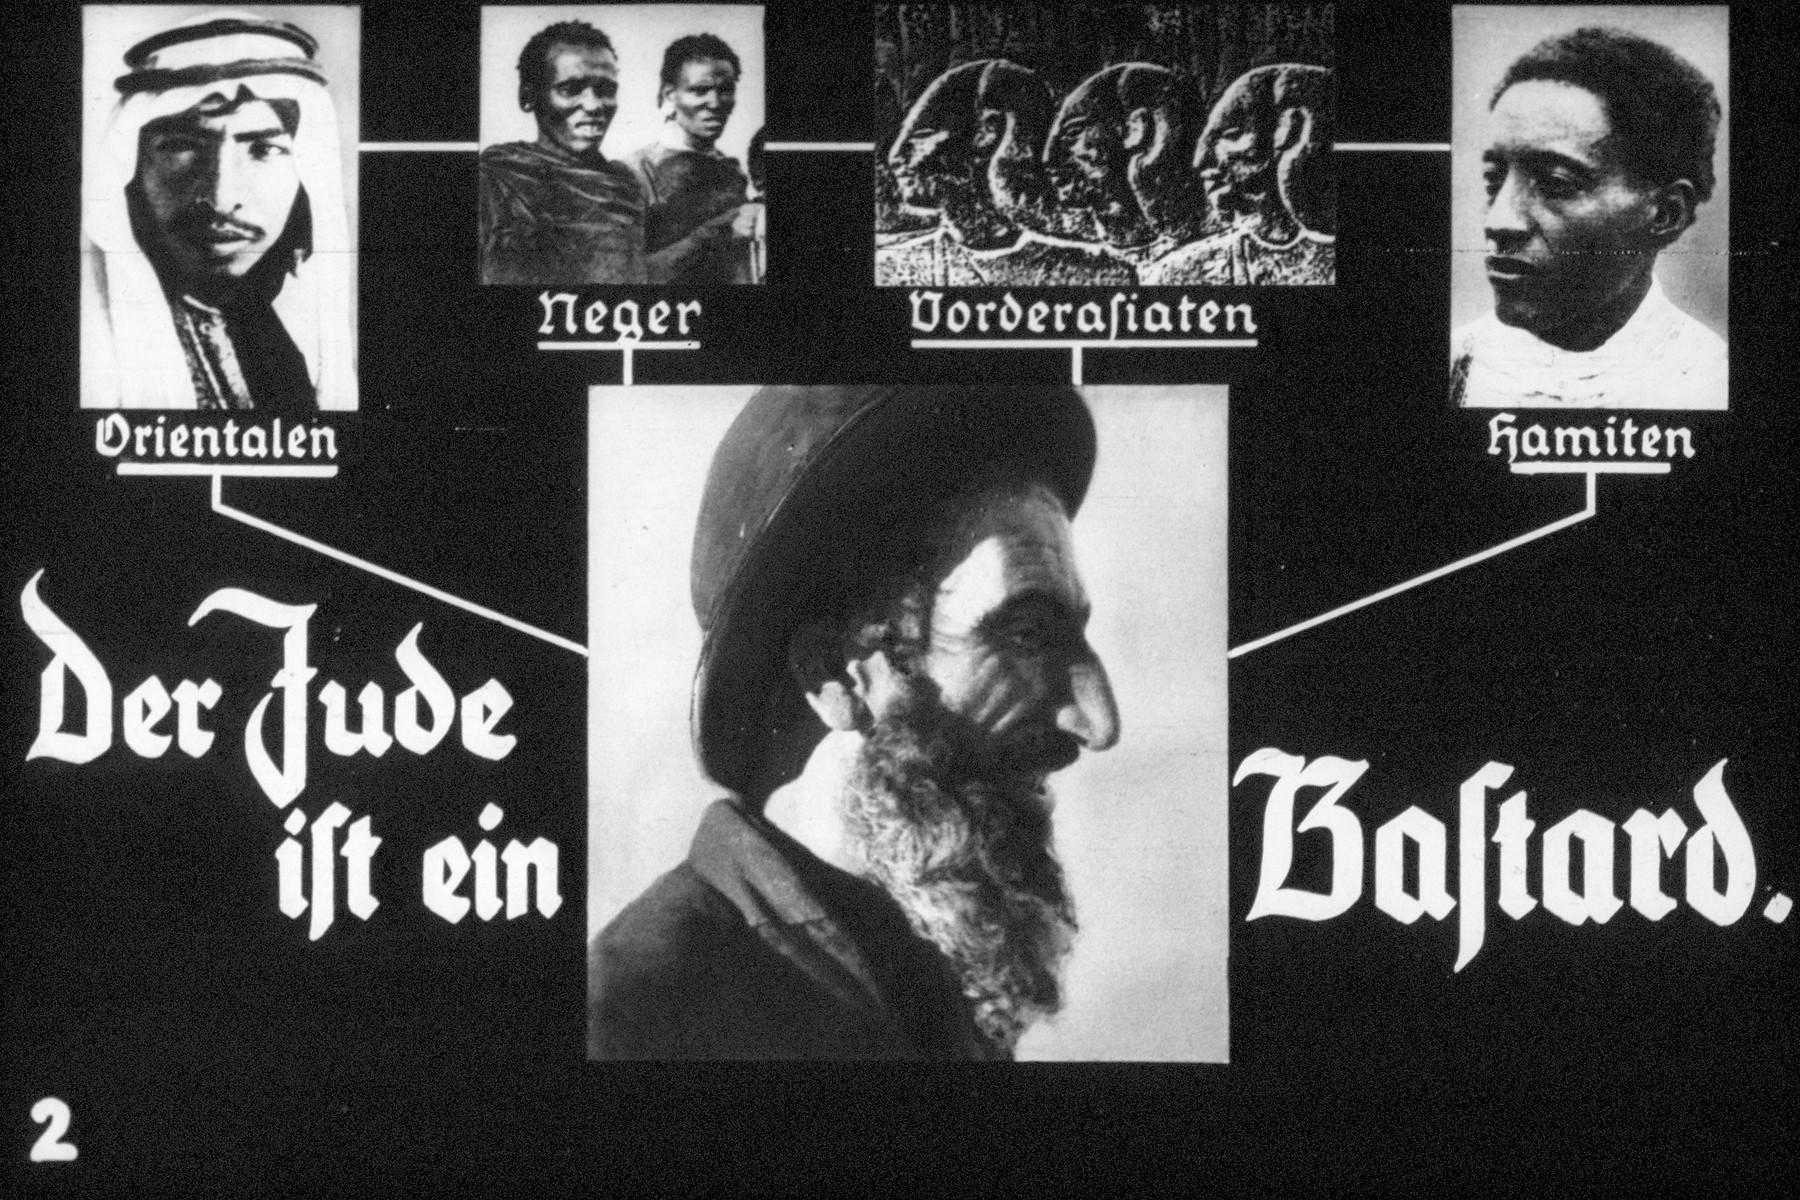 2nd nazi propaganda slide of a hitler youth educational